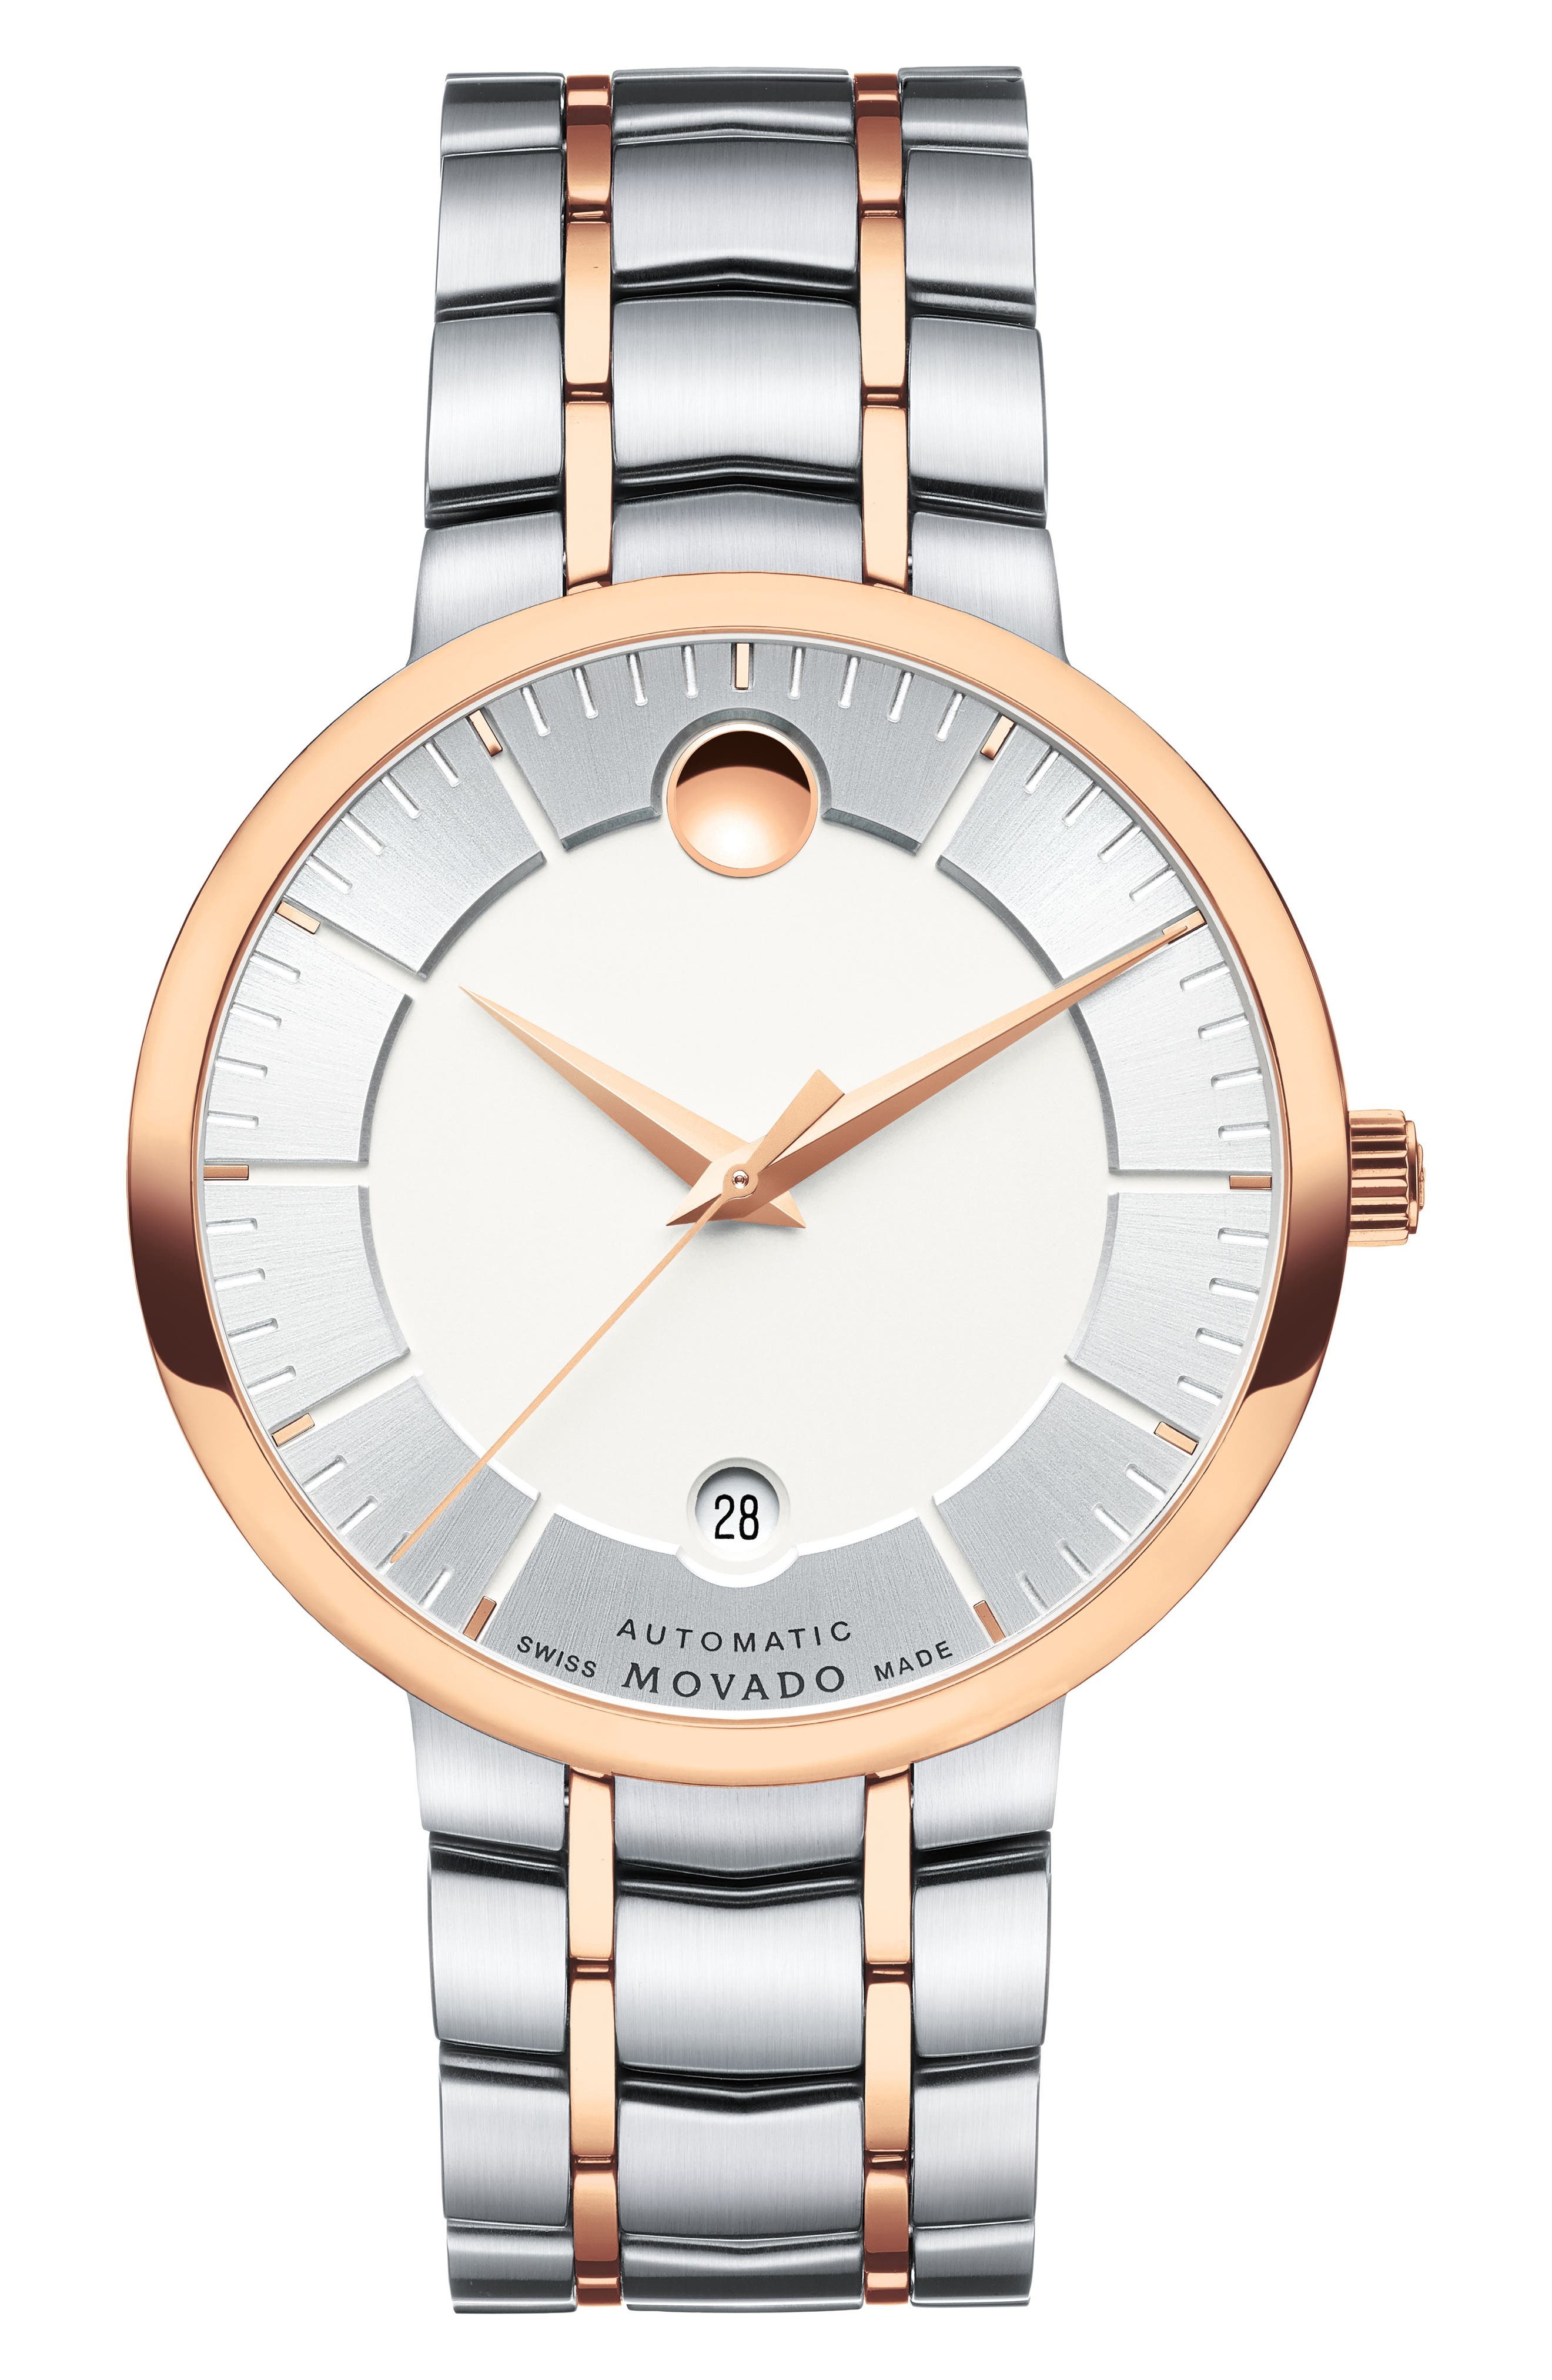 Main Image - Movado 1881 Automatic Bracelet Watch, 40mm